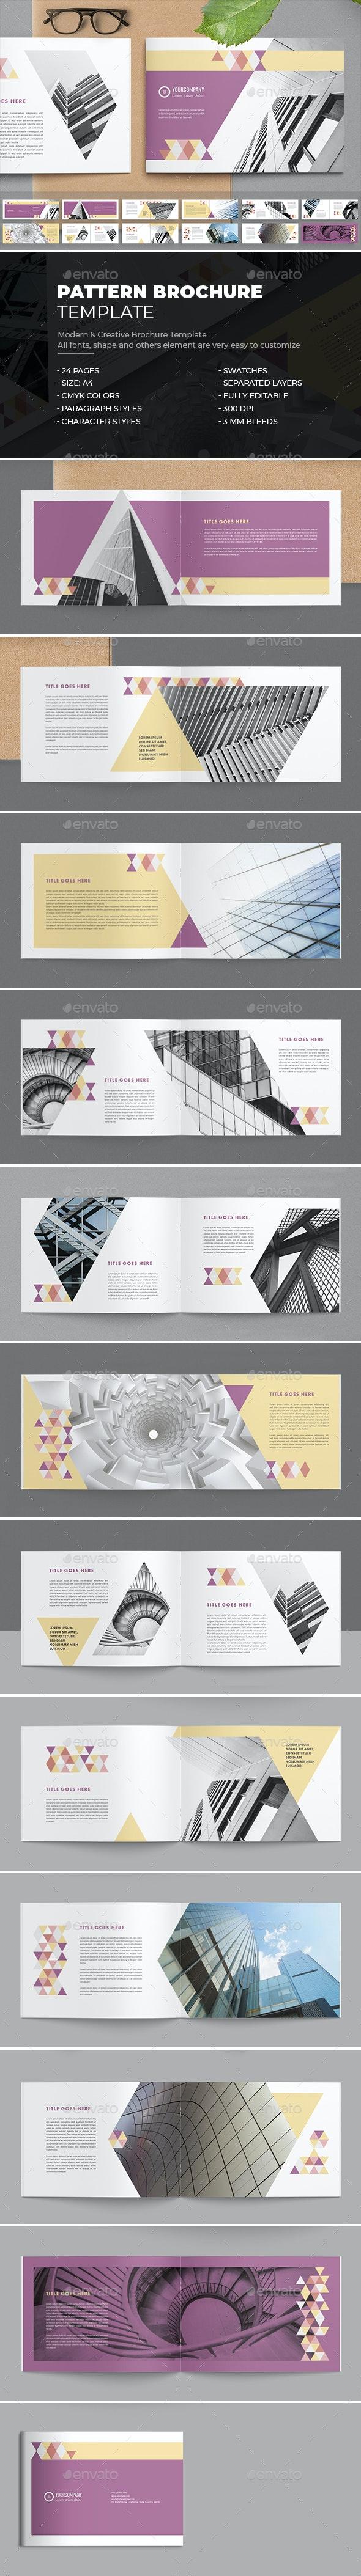 Modern Pattern Brochure - Brochures Print Templates